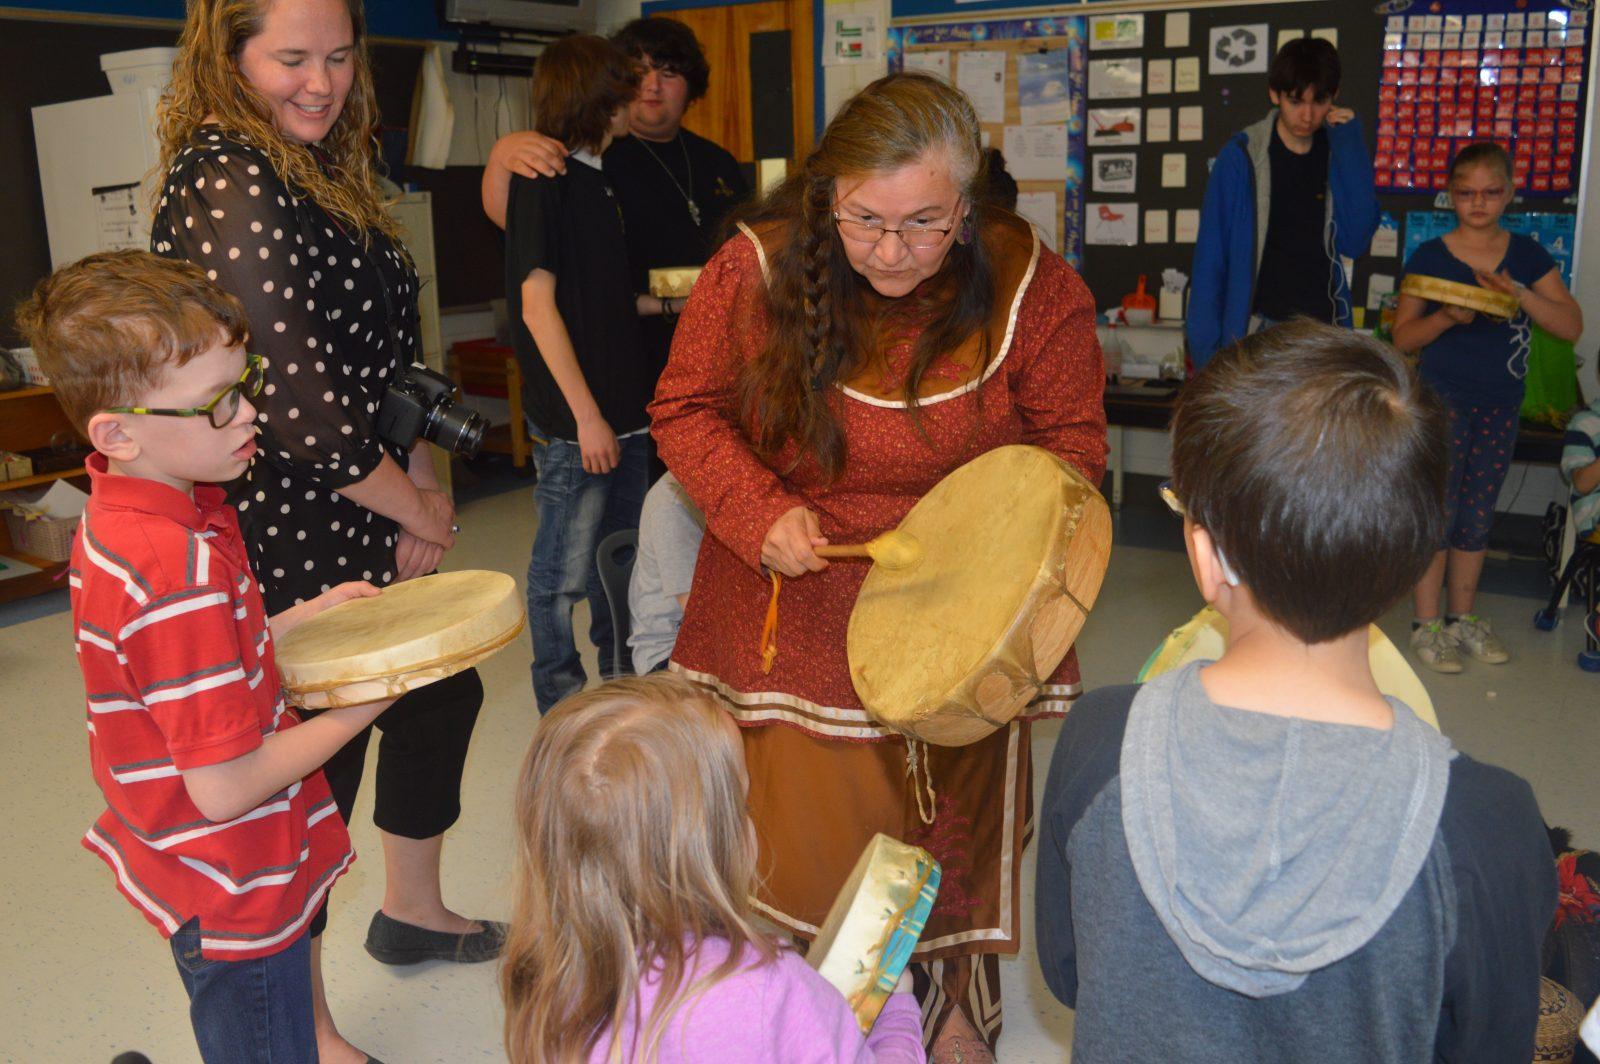 Students awaken their drums